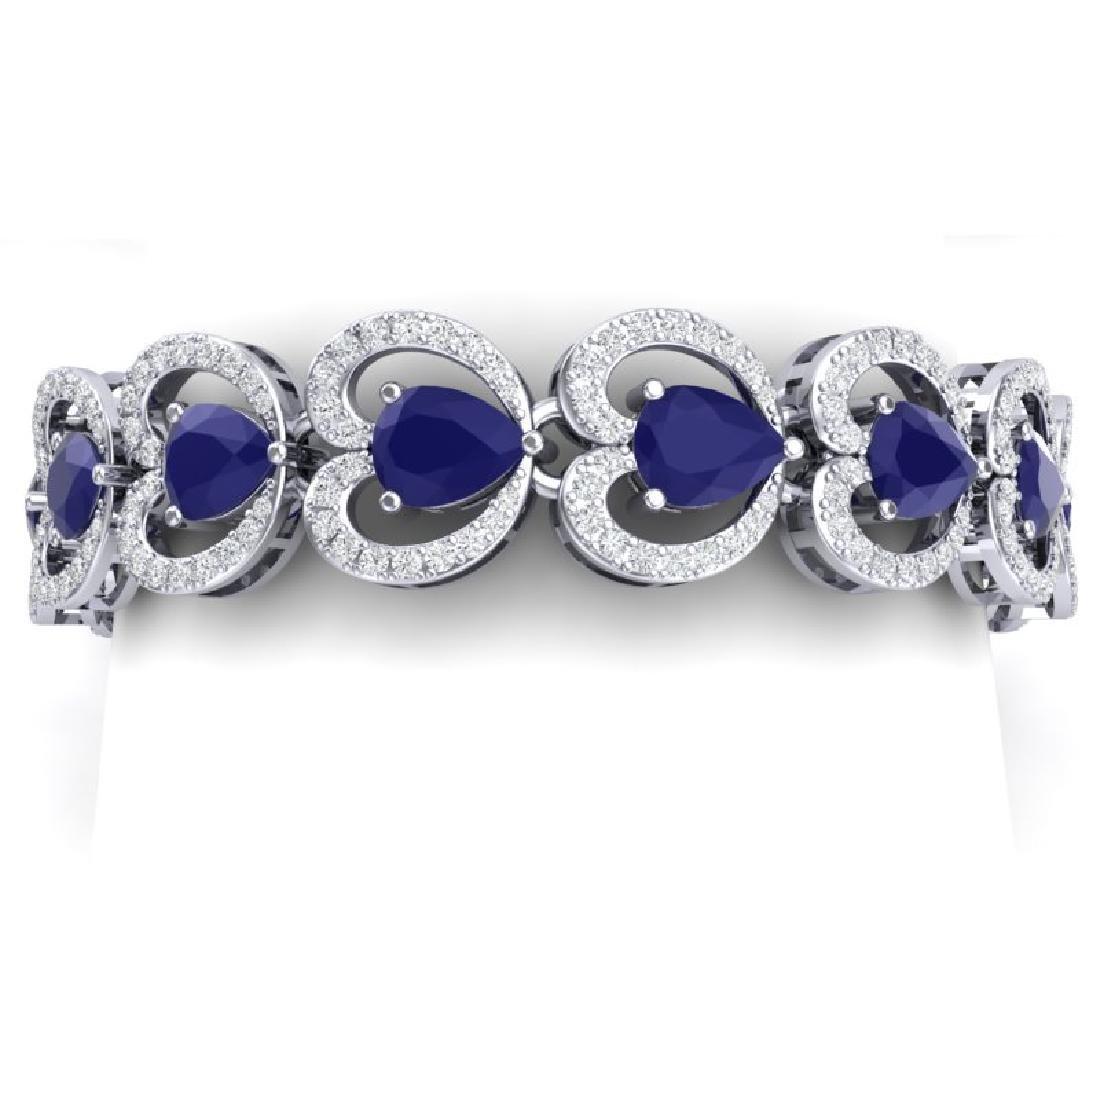 32.15 CTW Royalty Sapphire & VS Diamond Bracelet 18K